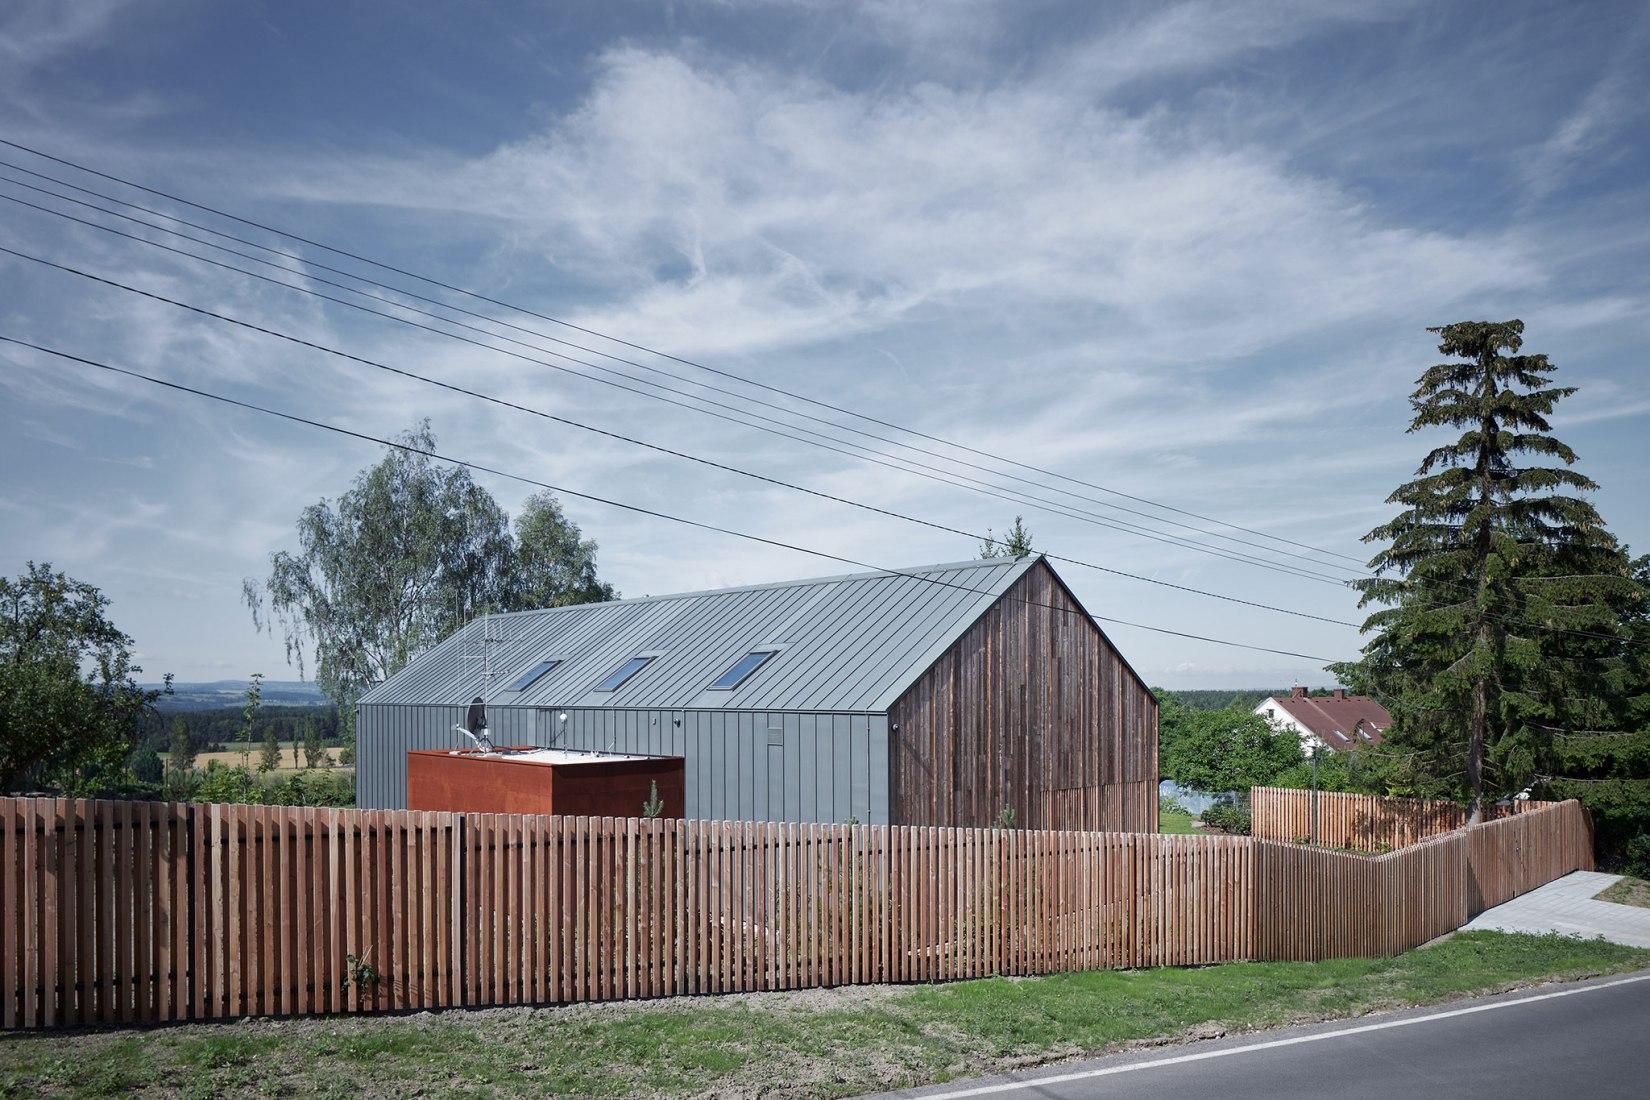 Casa Engel por CMC architects. Fotografía © BoysPlayNice